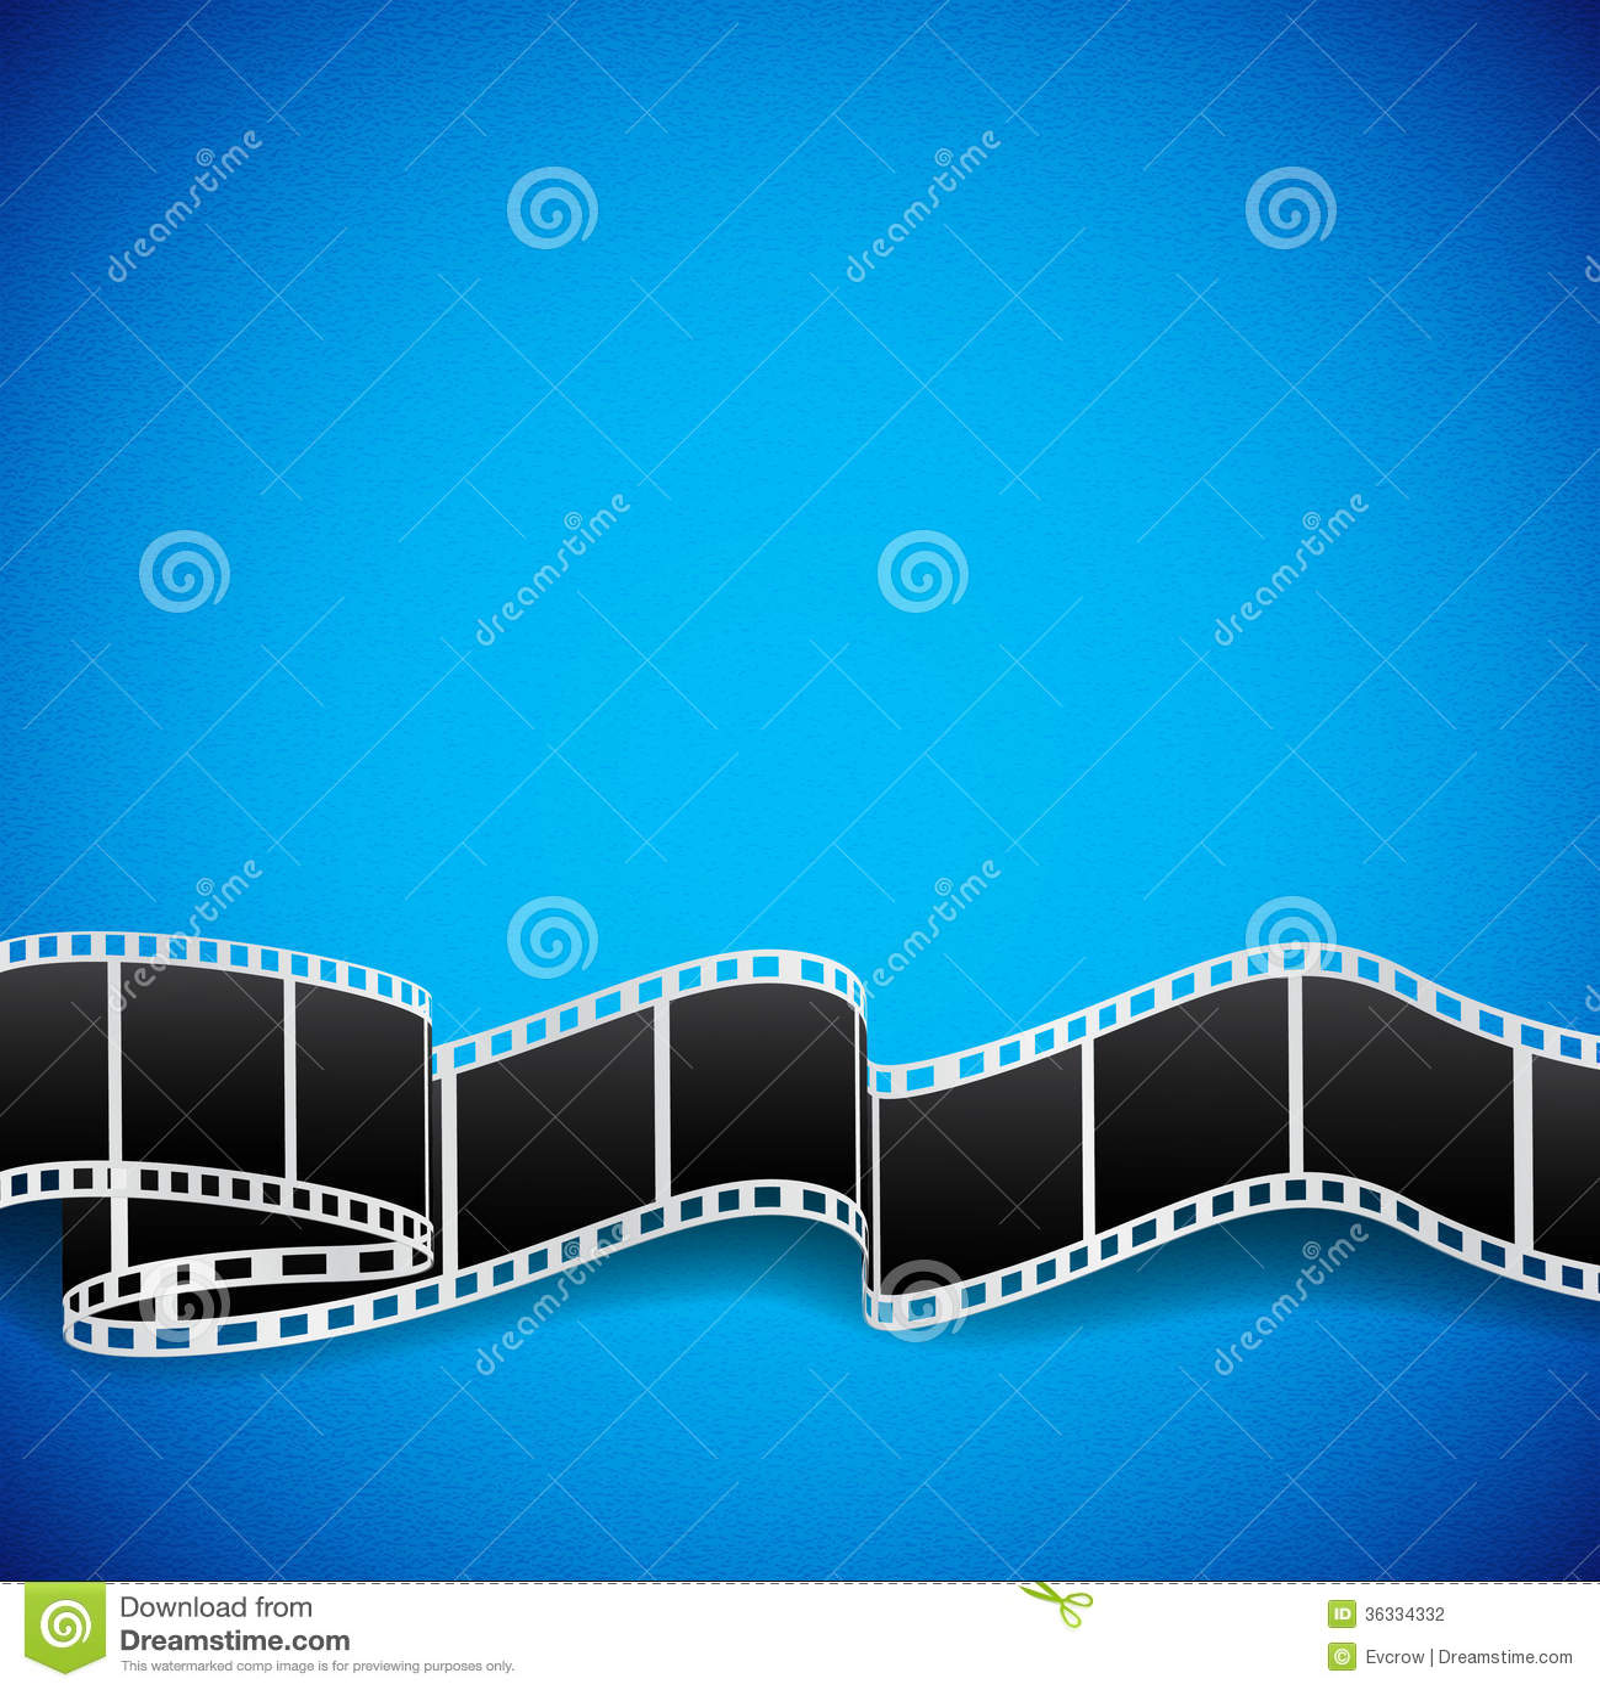 Film Reel Background Stock Photography - Image: 36334332